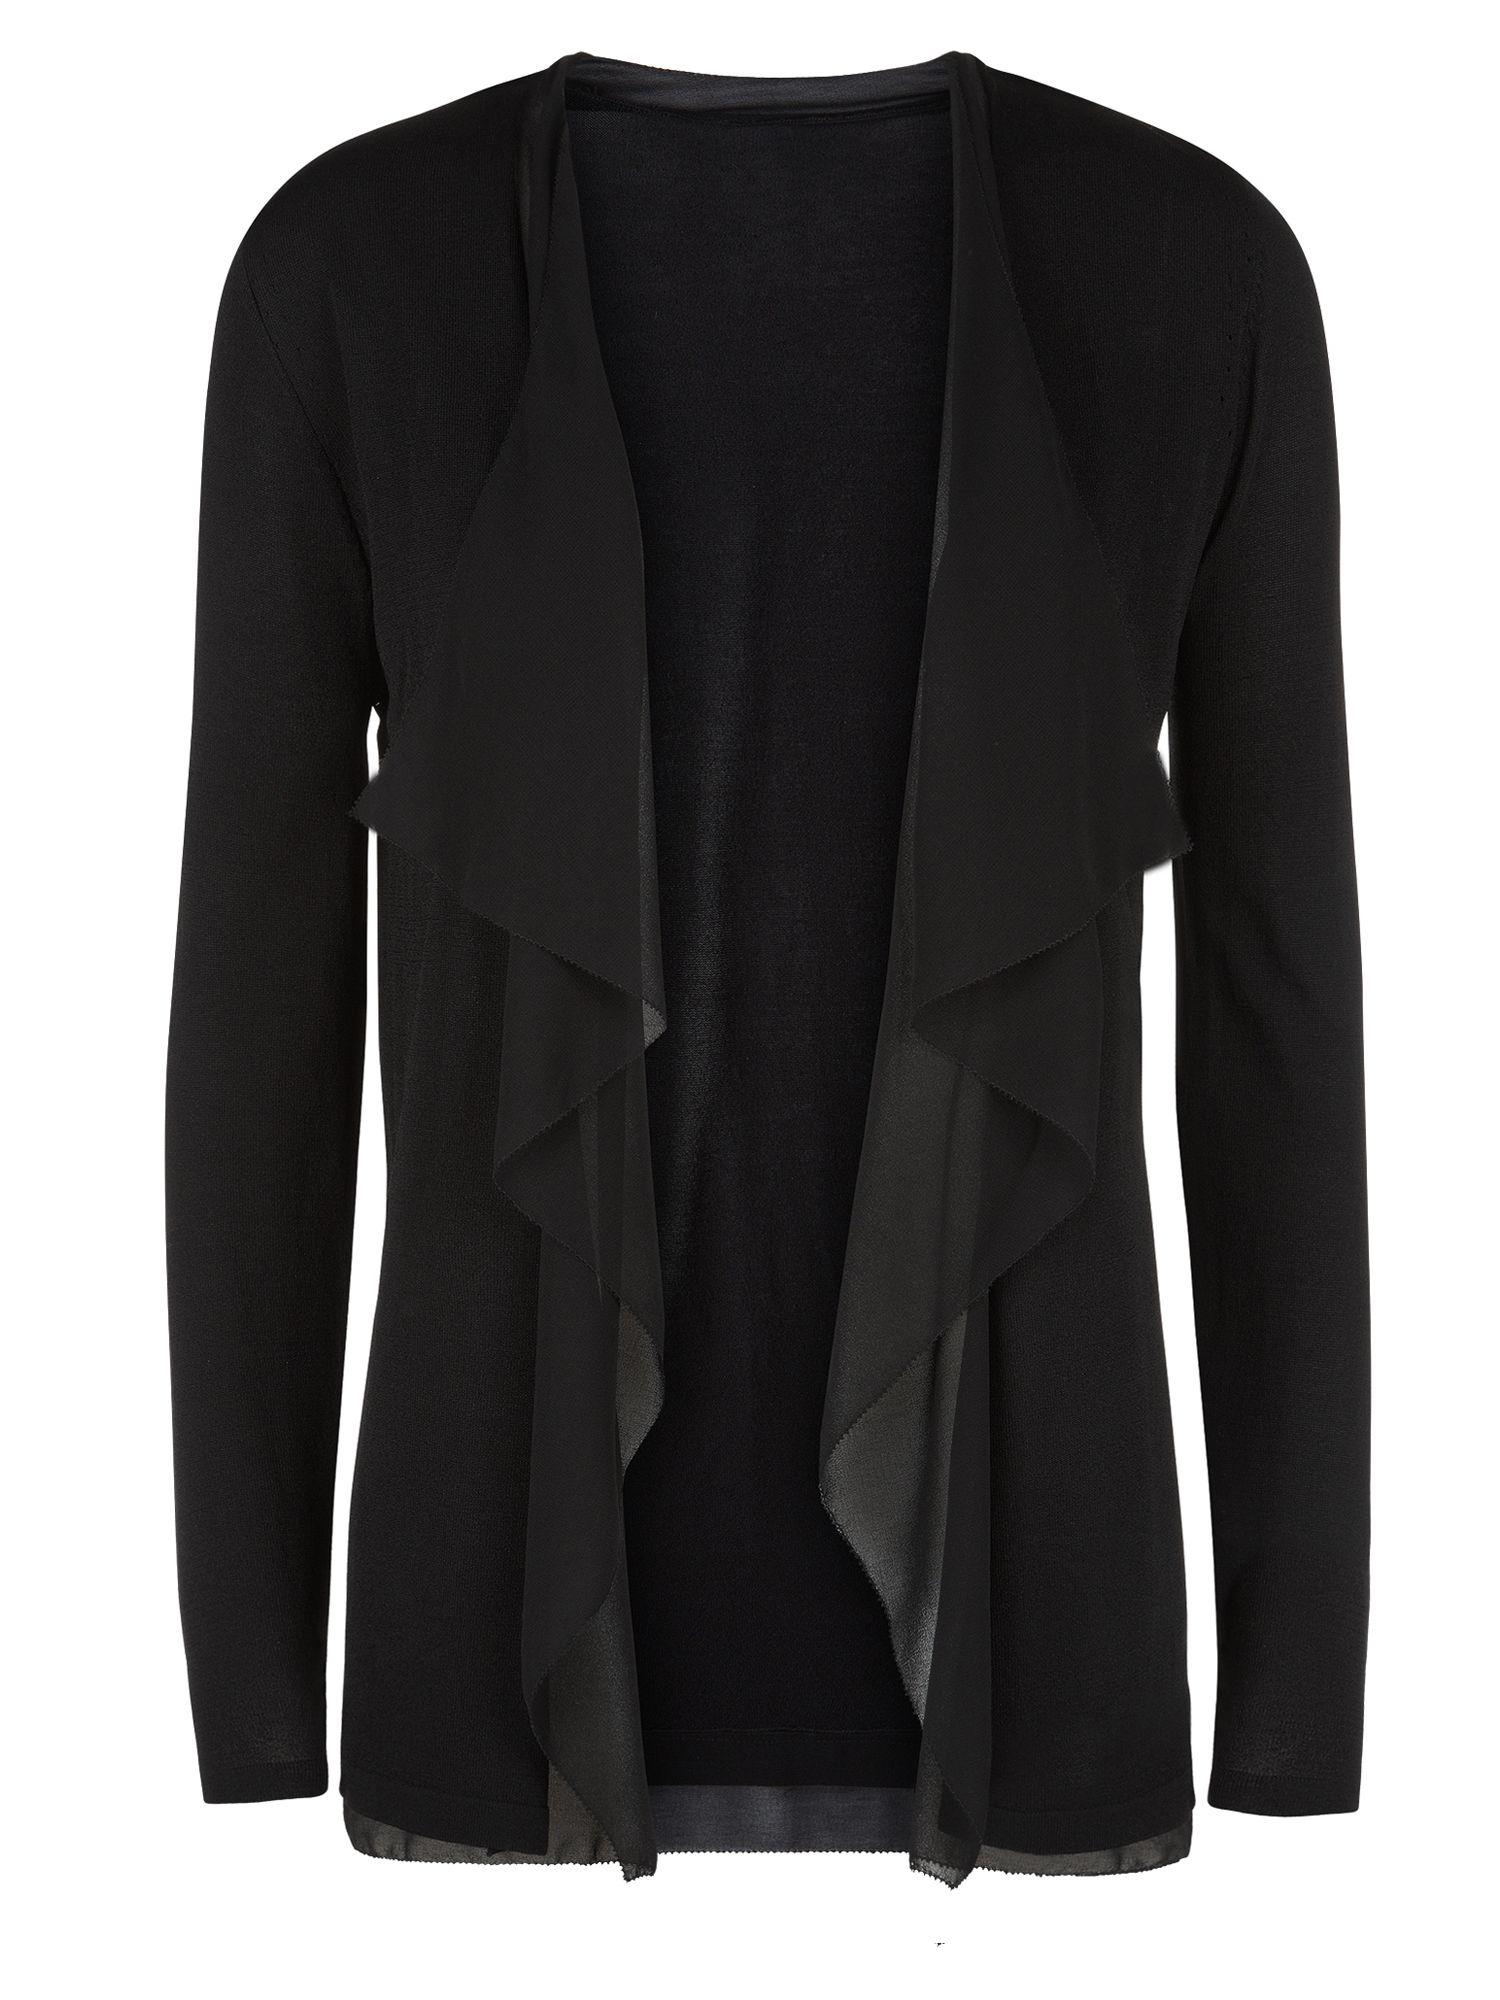 Jacques vert Chiffon Trim Waterfall Cardigan in Black | Lyst